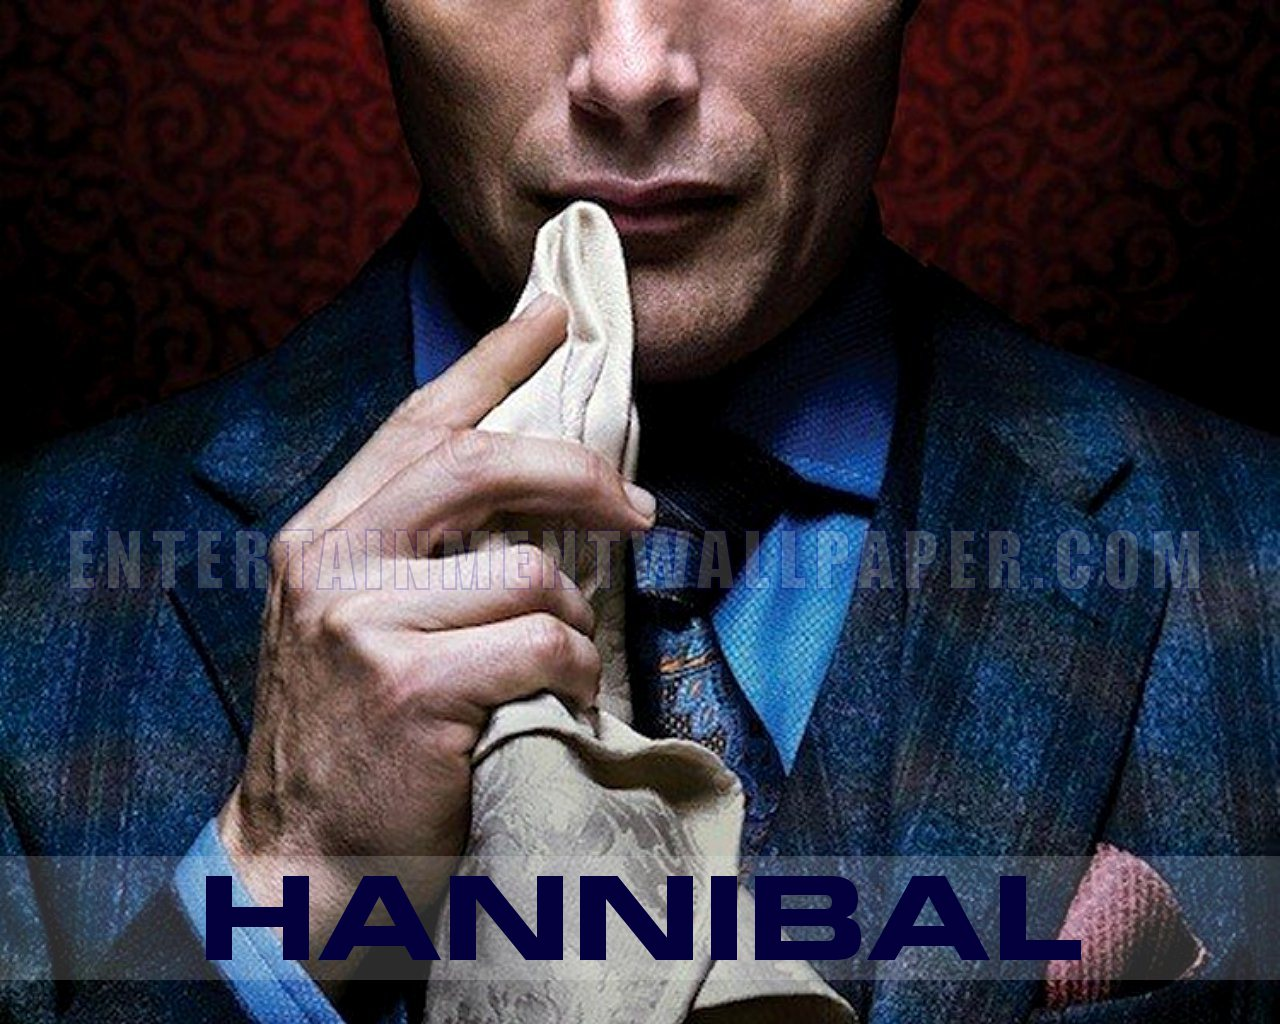 Hannibal 바탕화면